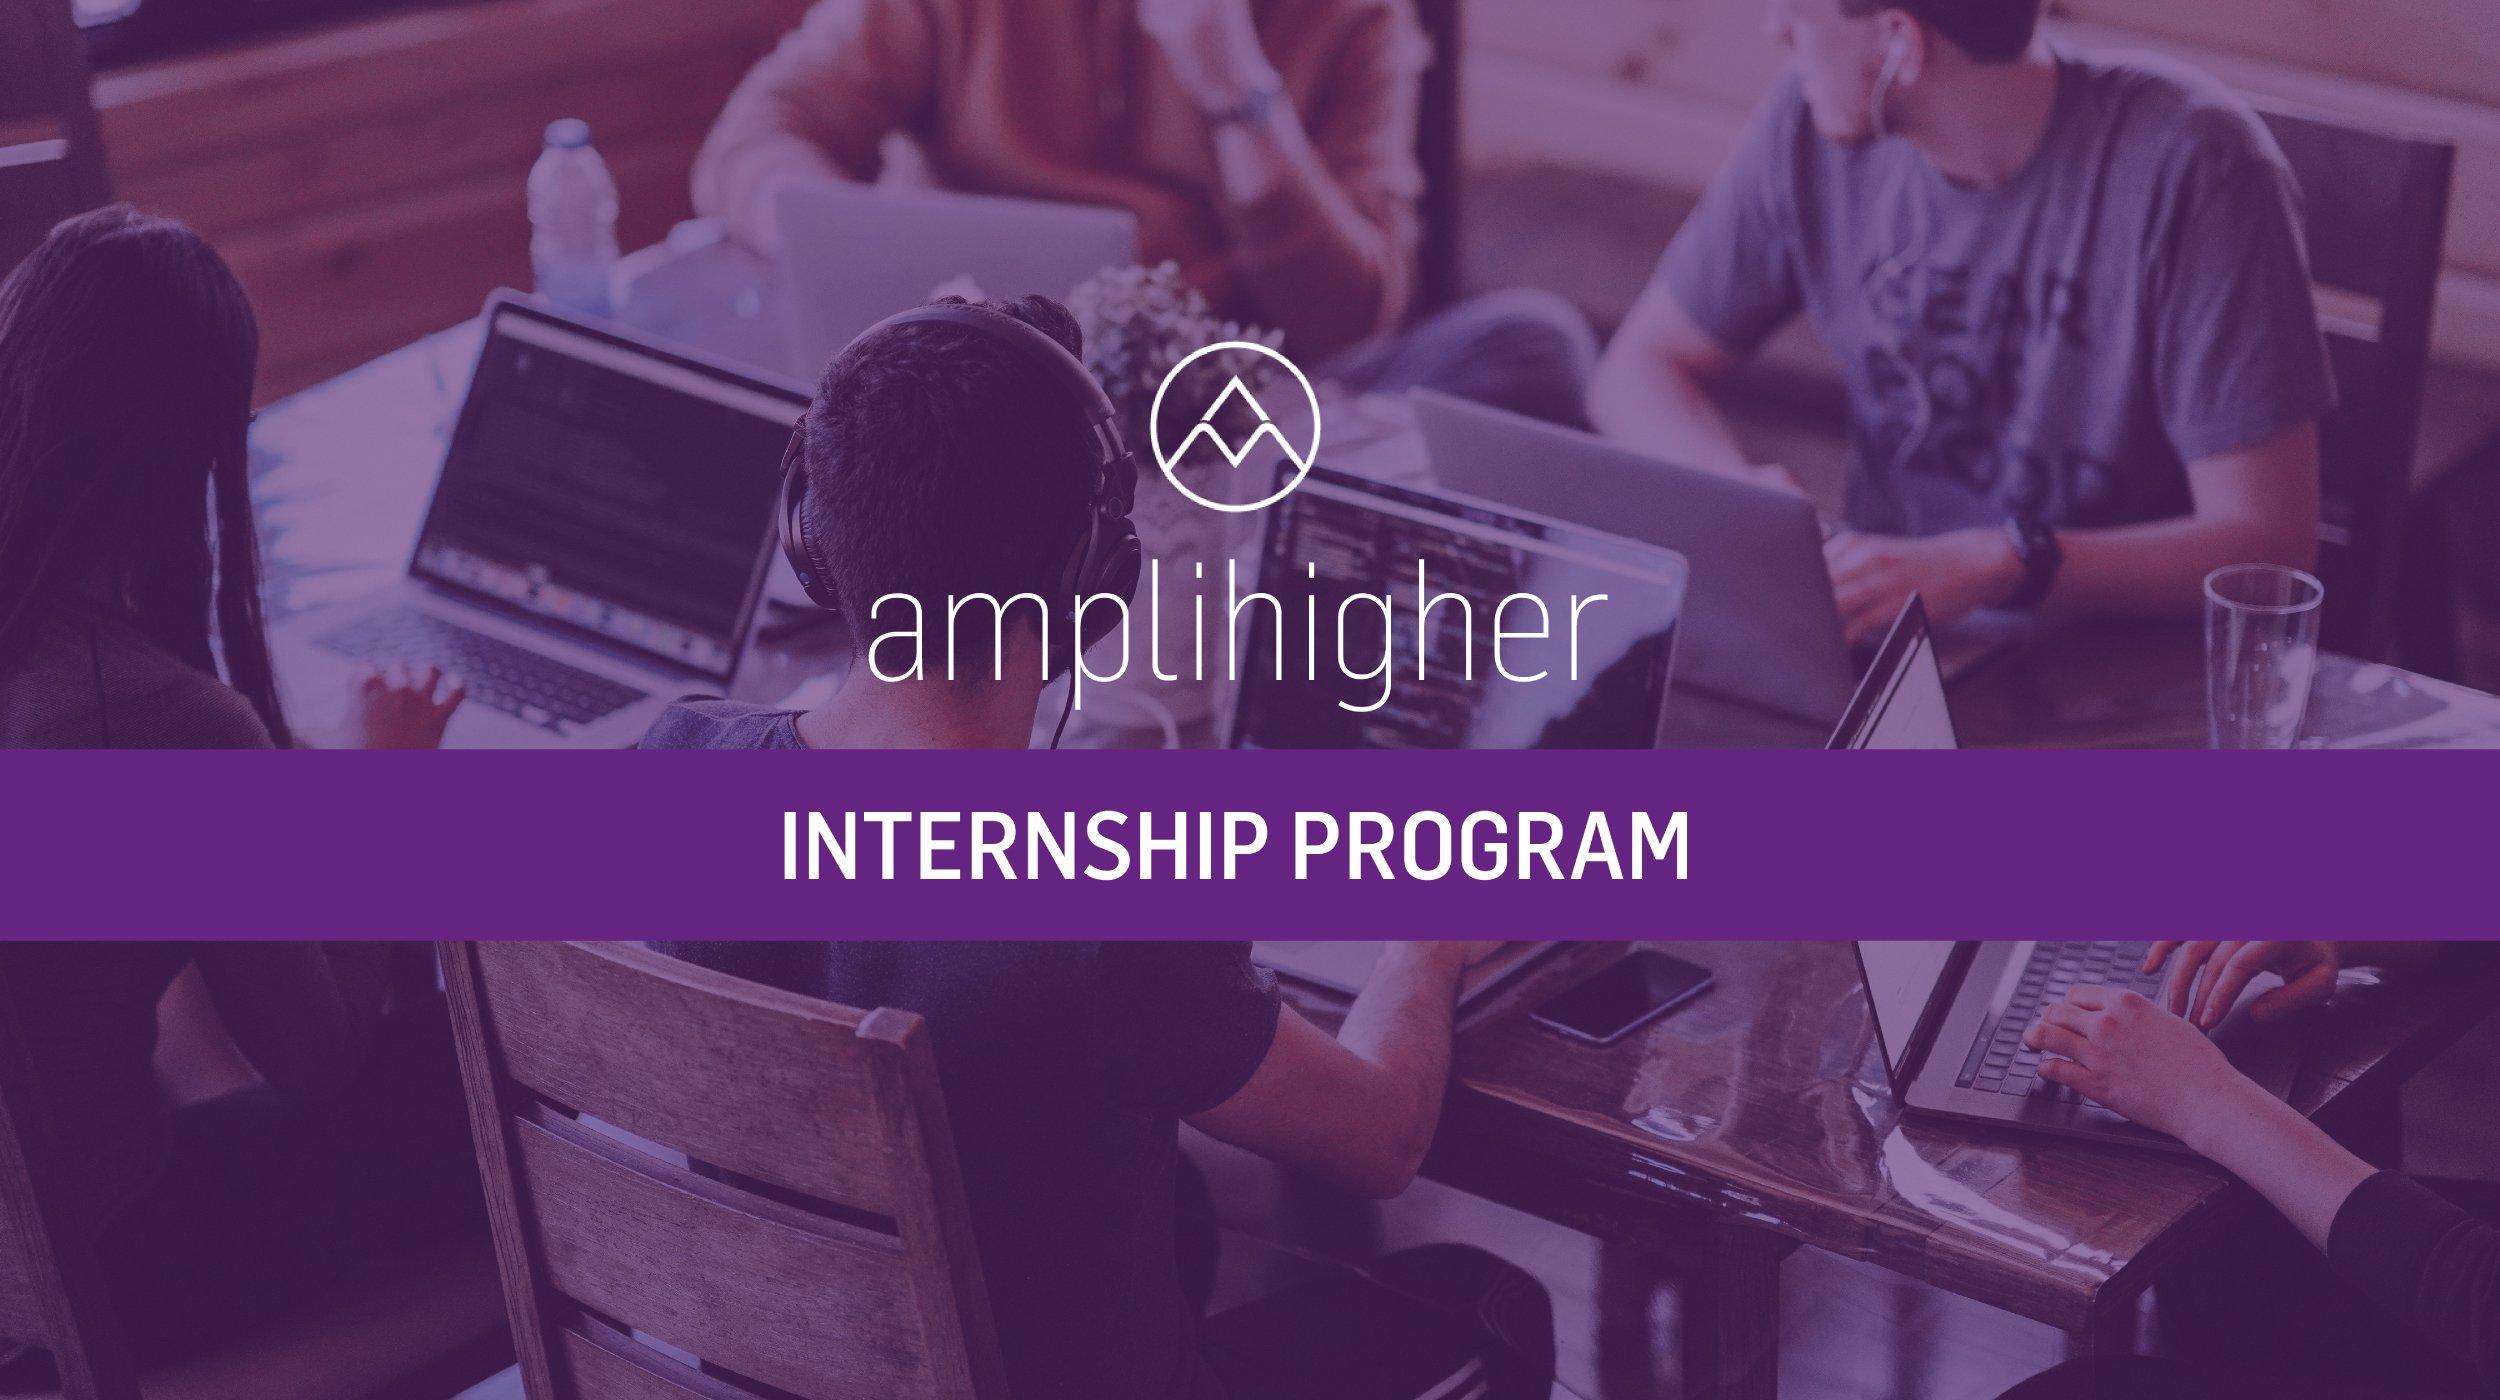 Amplihigher-Copywriting-Internship-Program